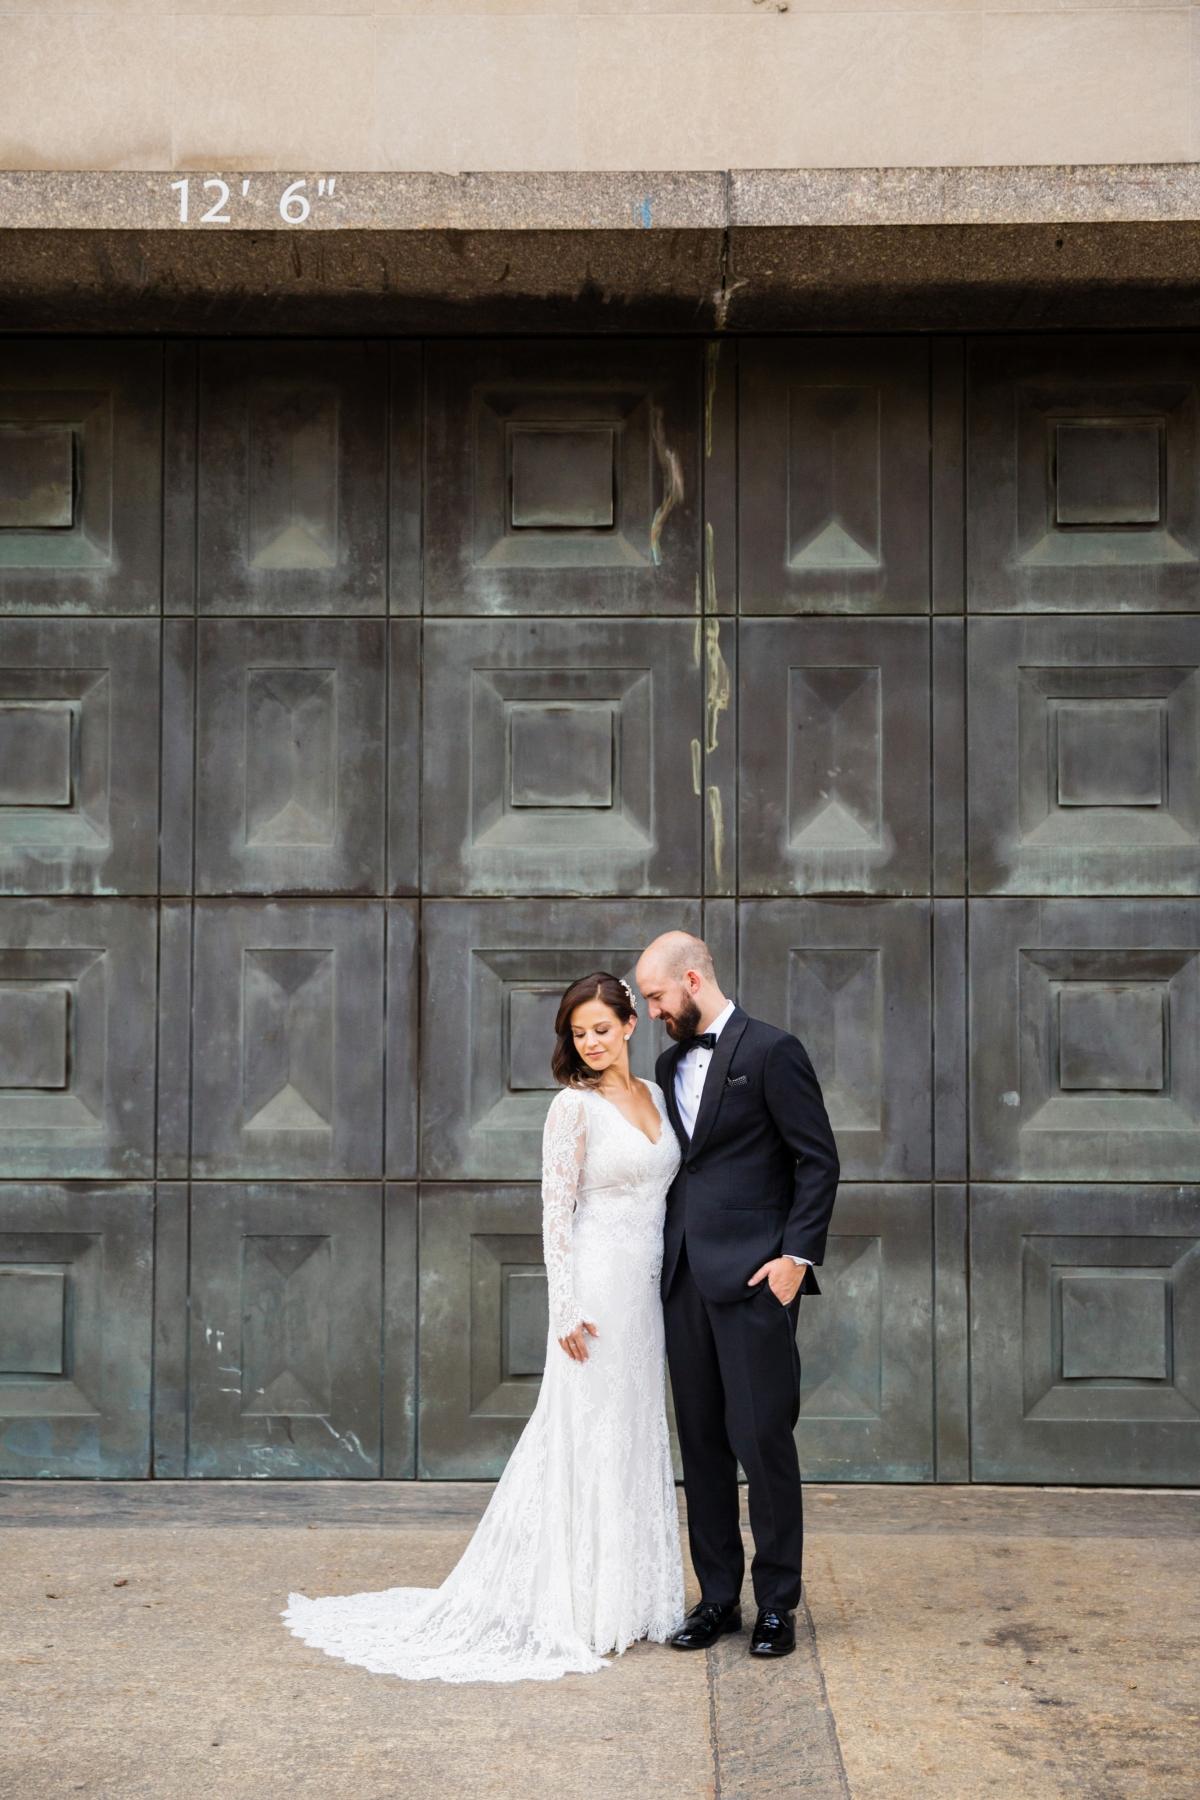 Chicago Wedding at Revel Fulton Market